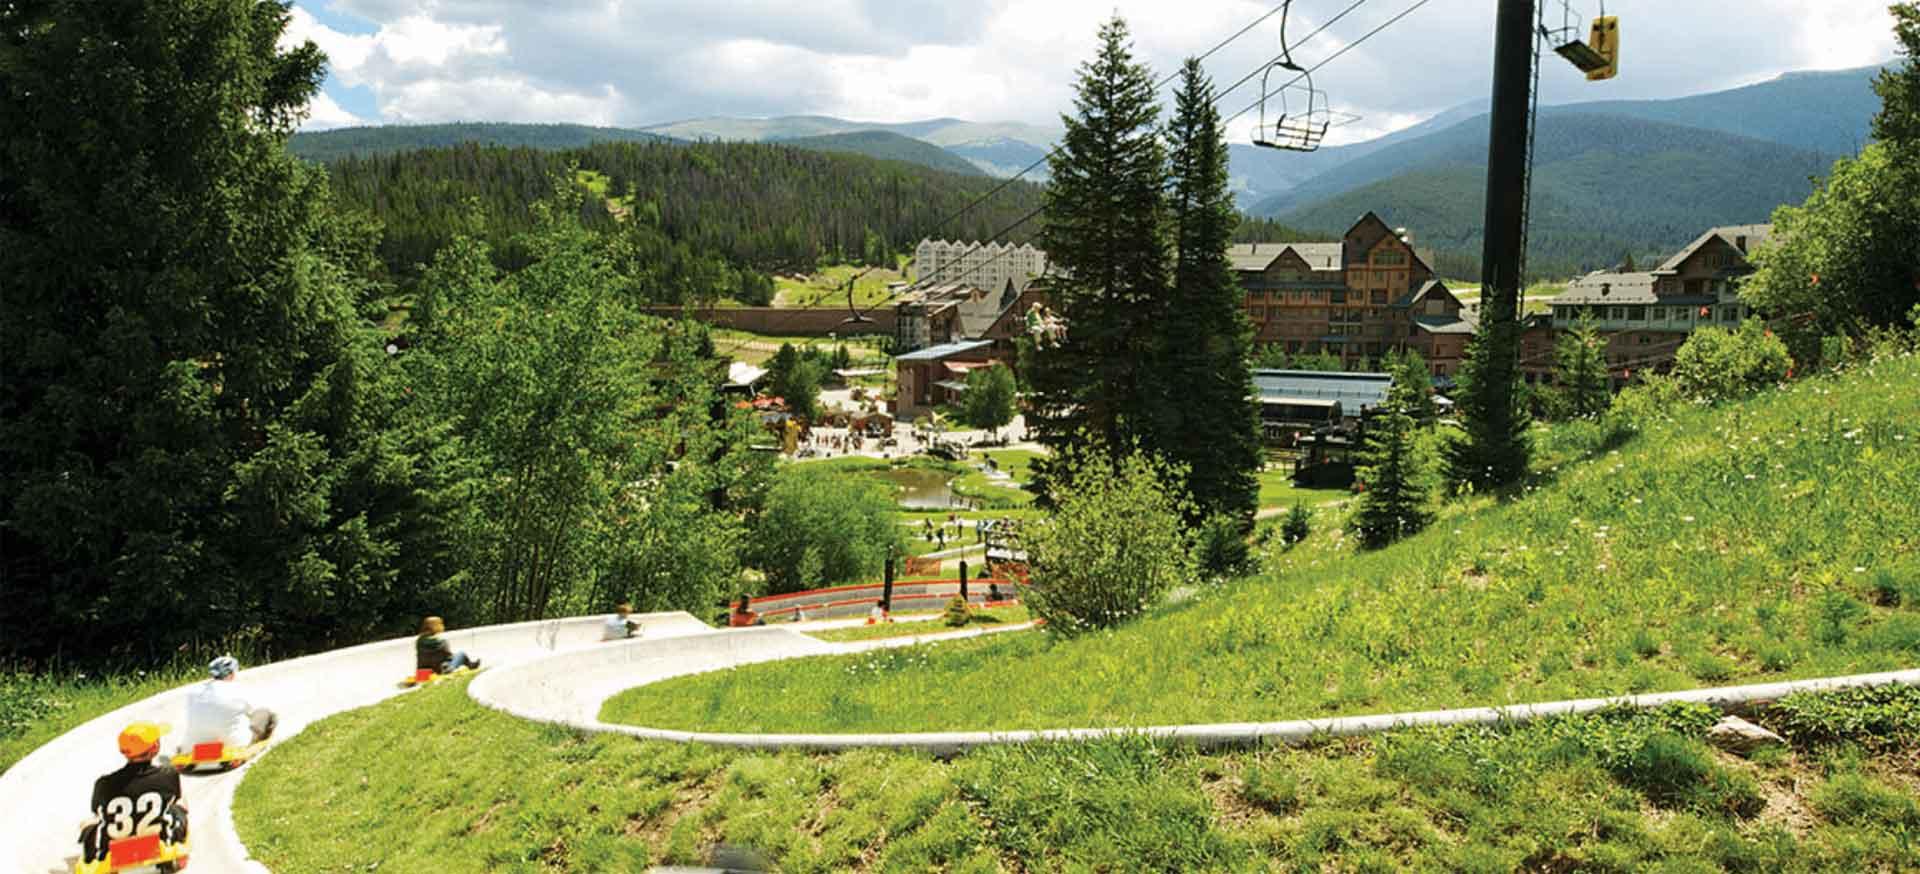 Summer ski slopes.